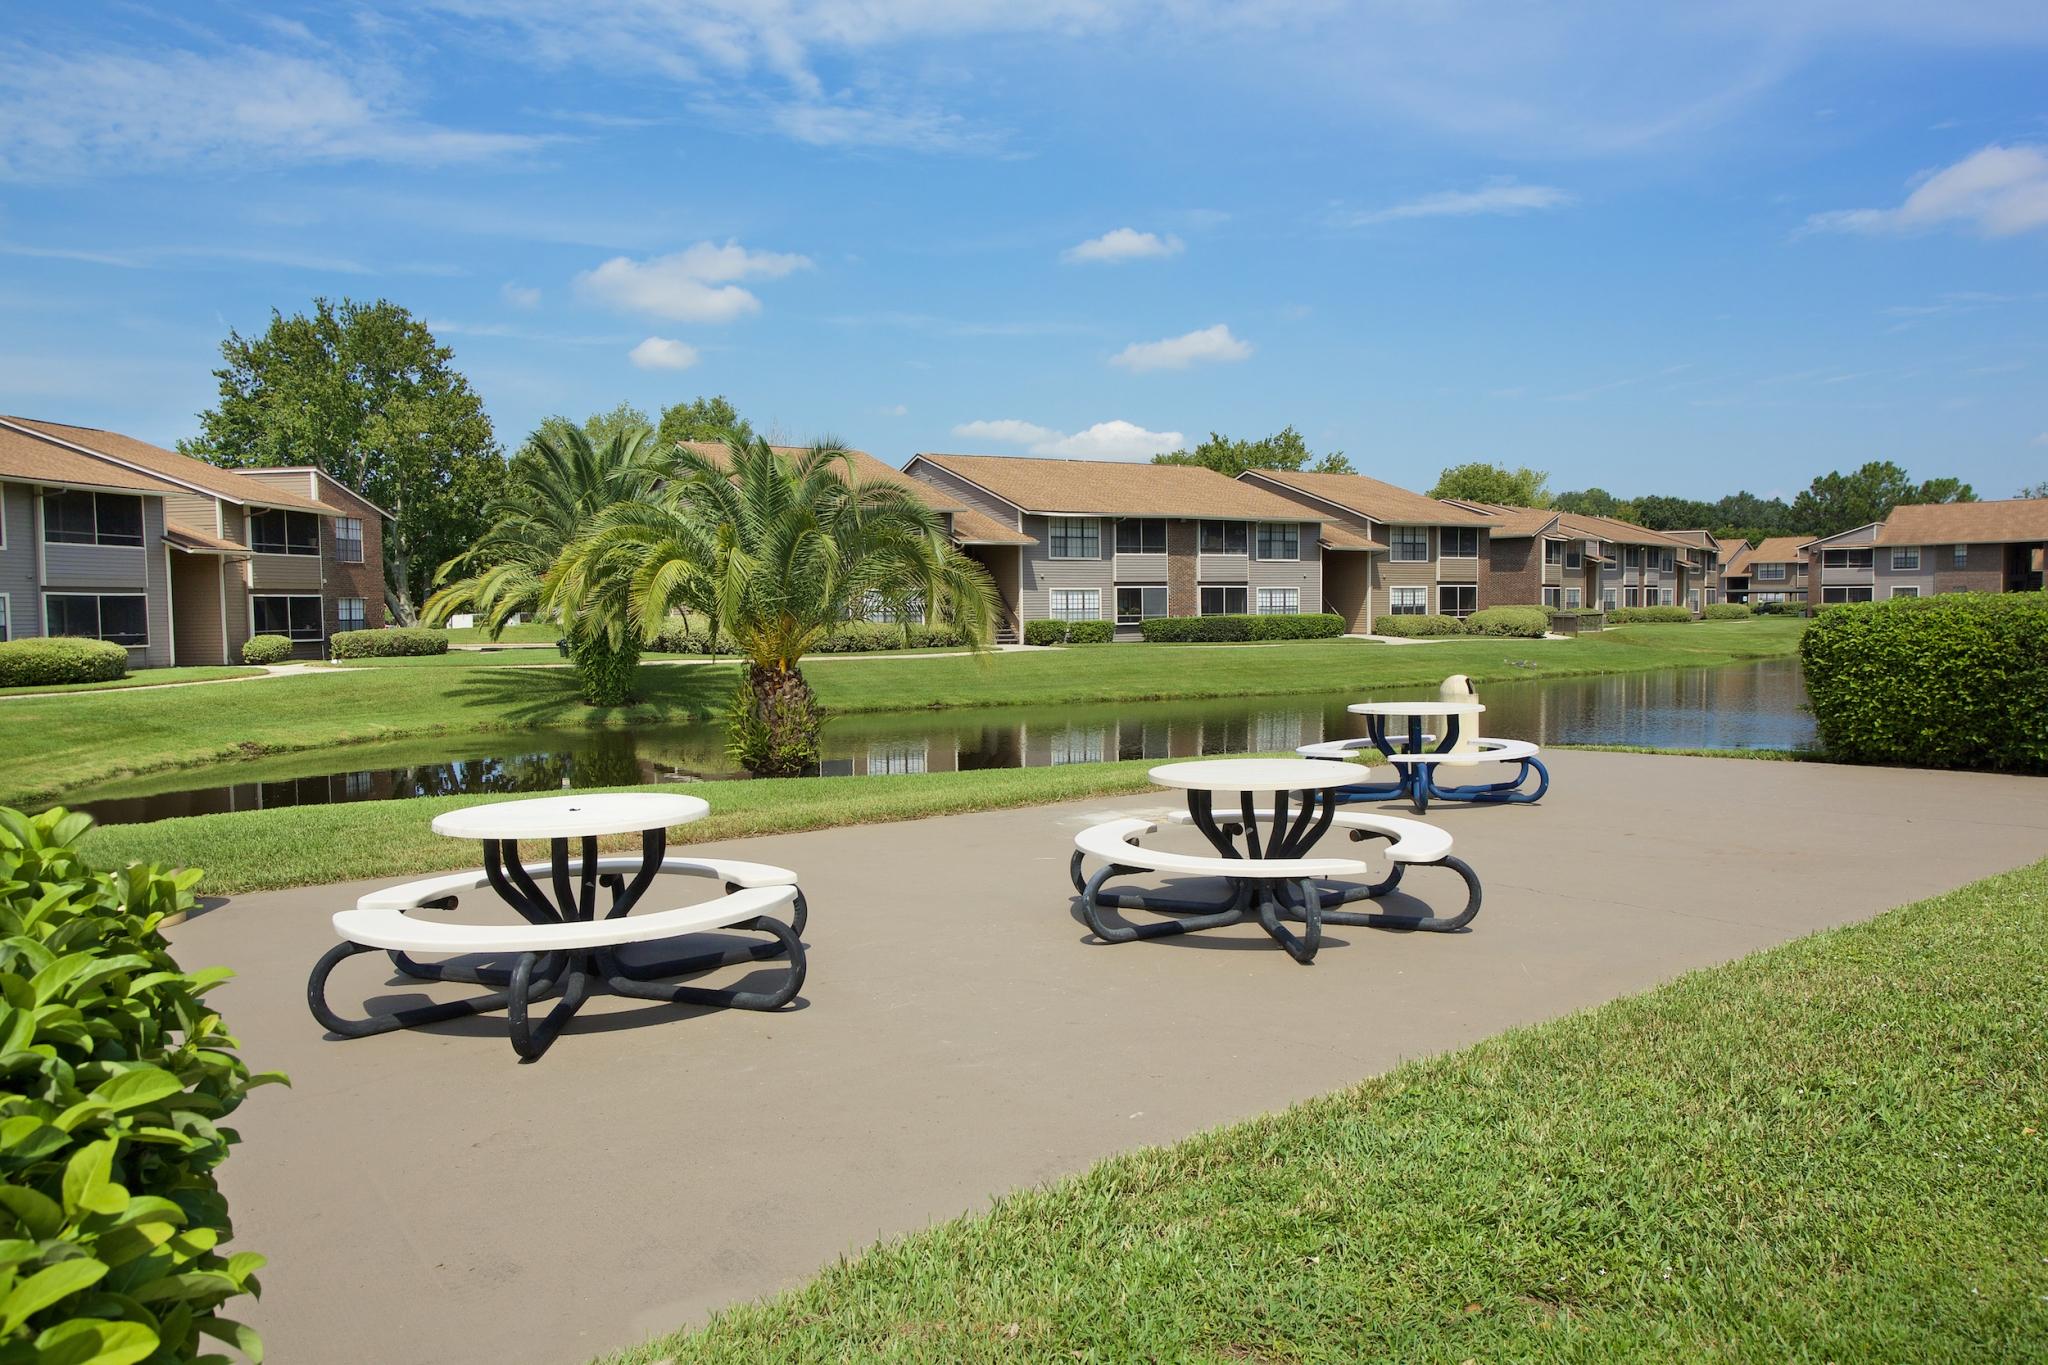 Bentley Green | Apartment Rentals in Jacksonville, Florida | BBQ Picnic Area